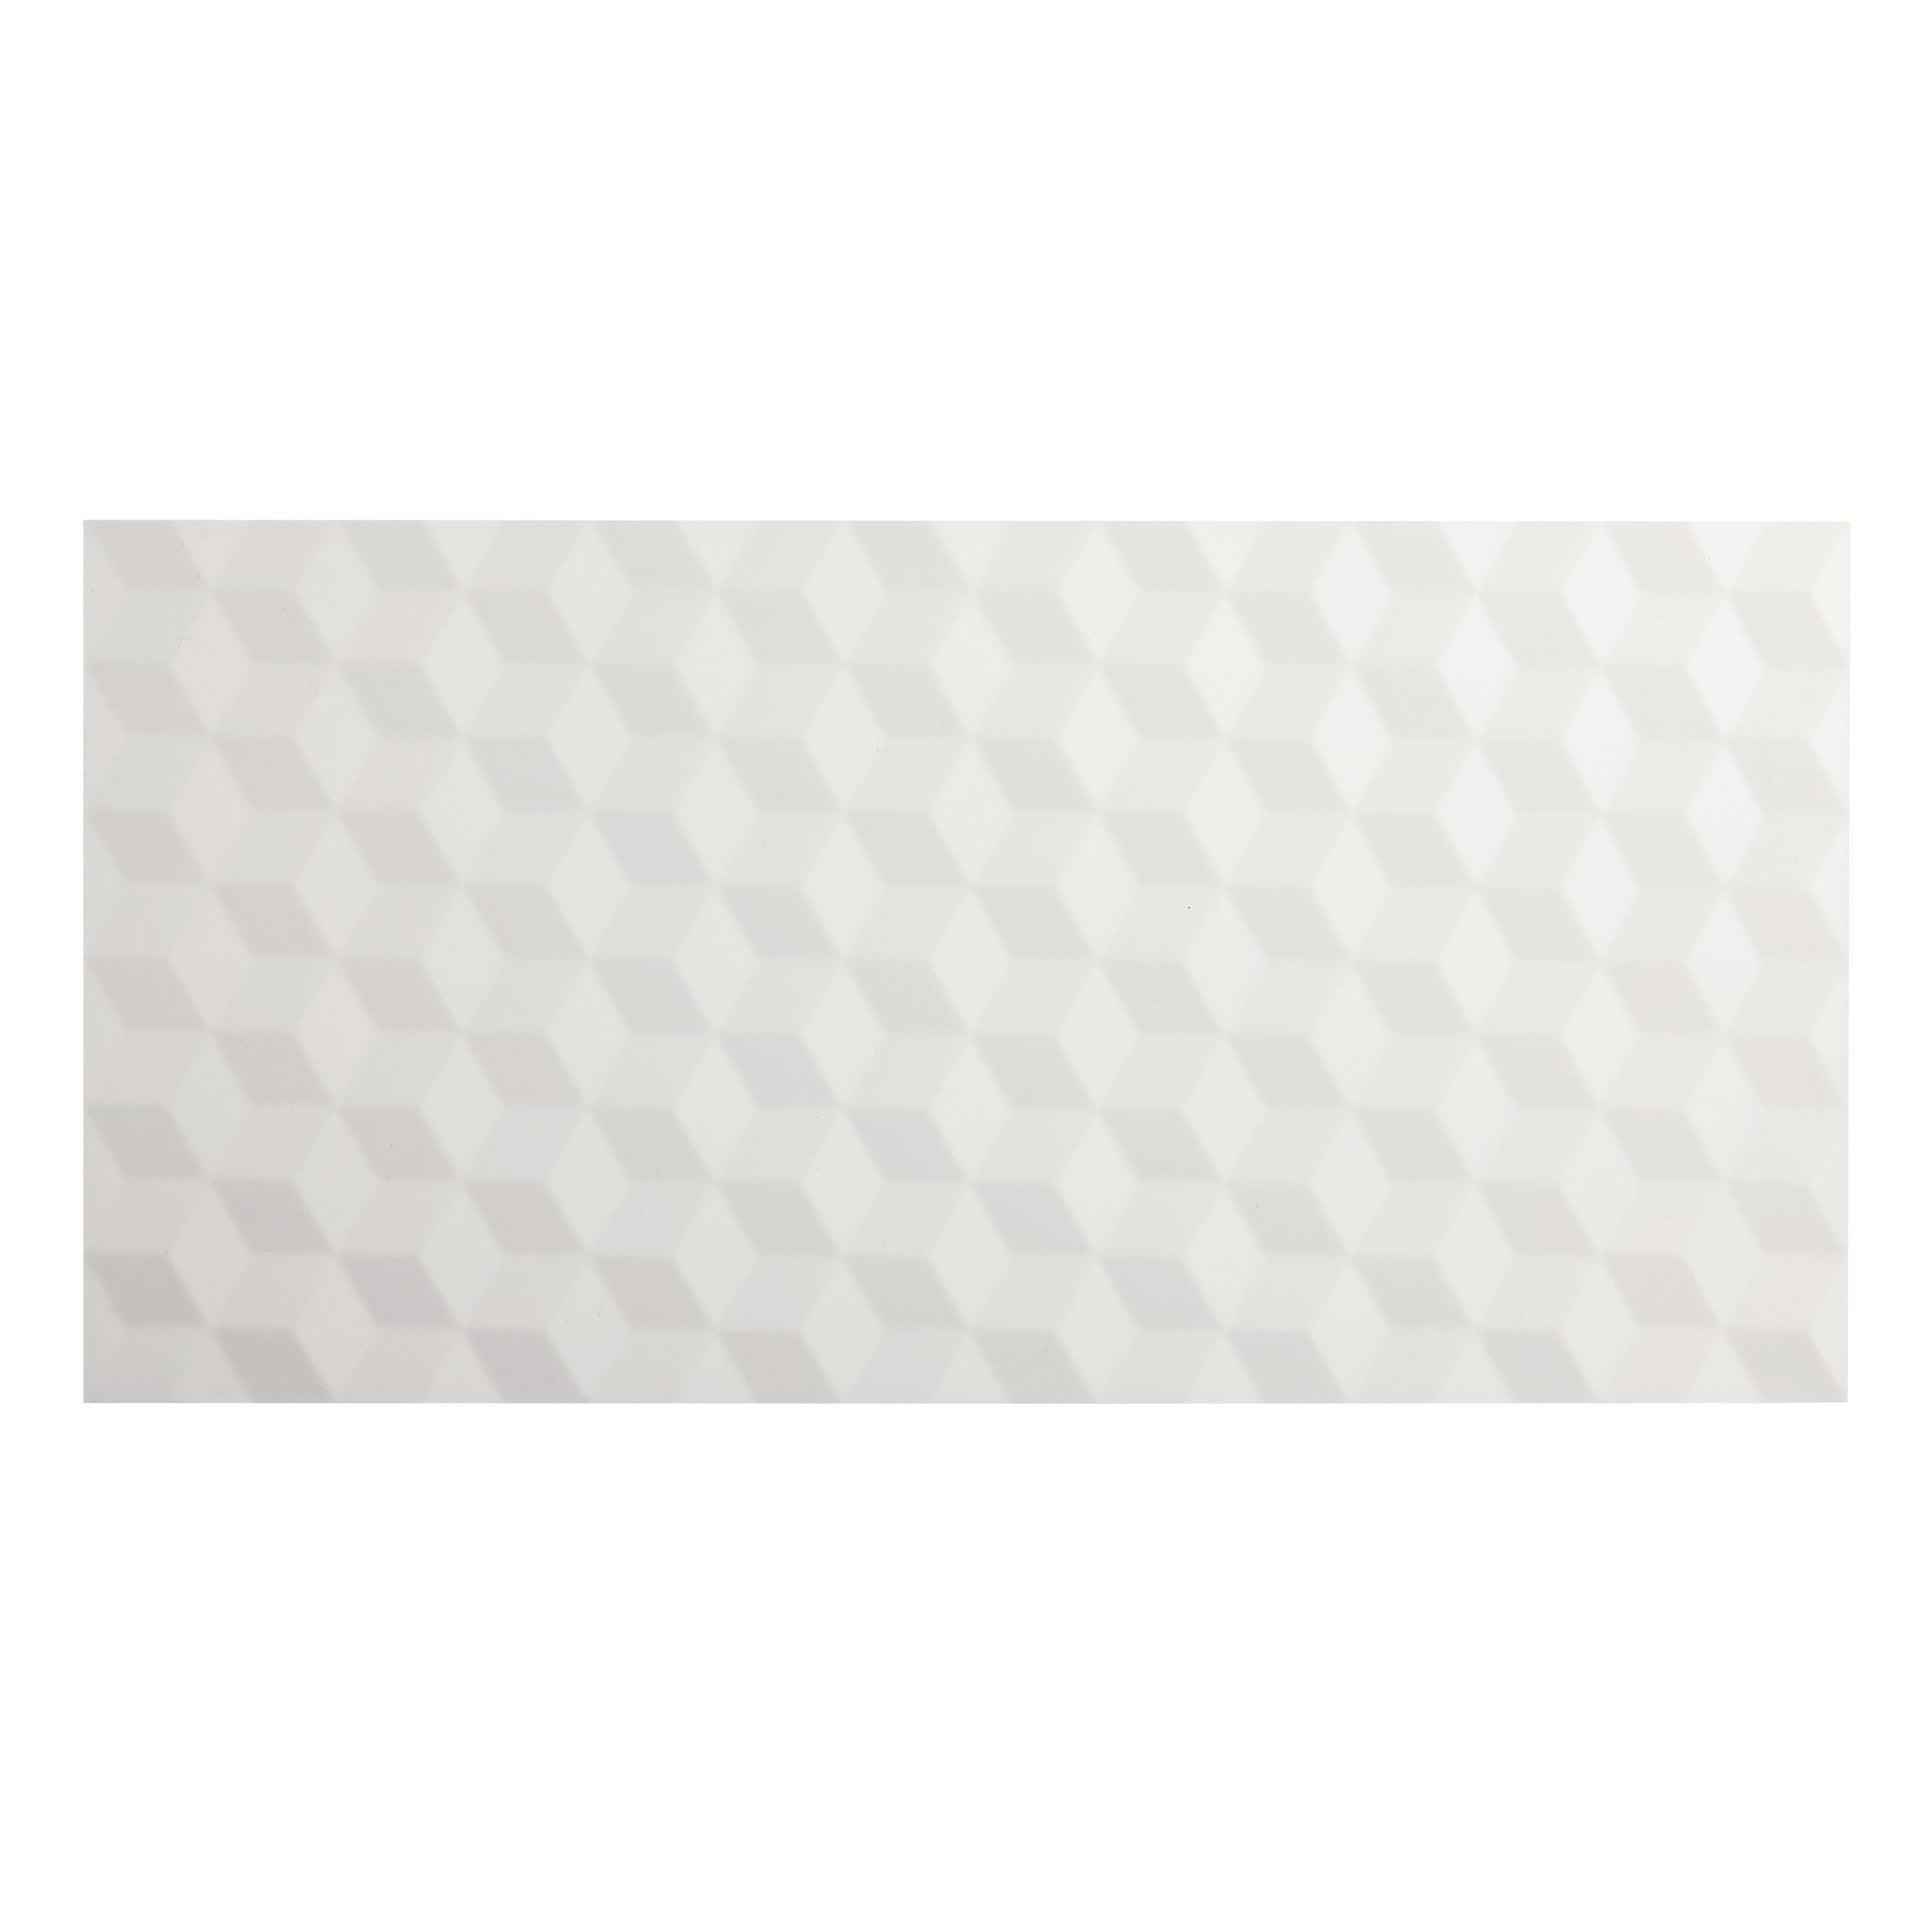 Piastrella per rivestimenti Arctic 30 x 60 cm sp. 9 mm bianco - 4